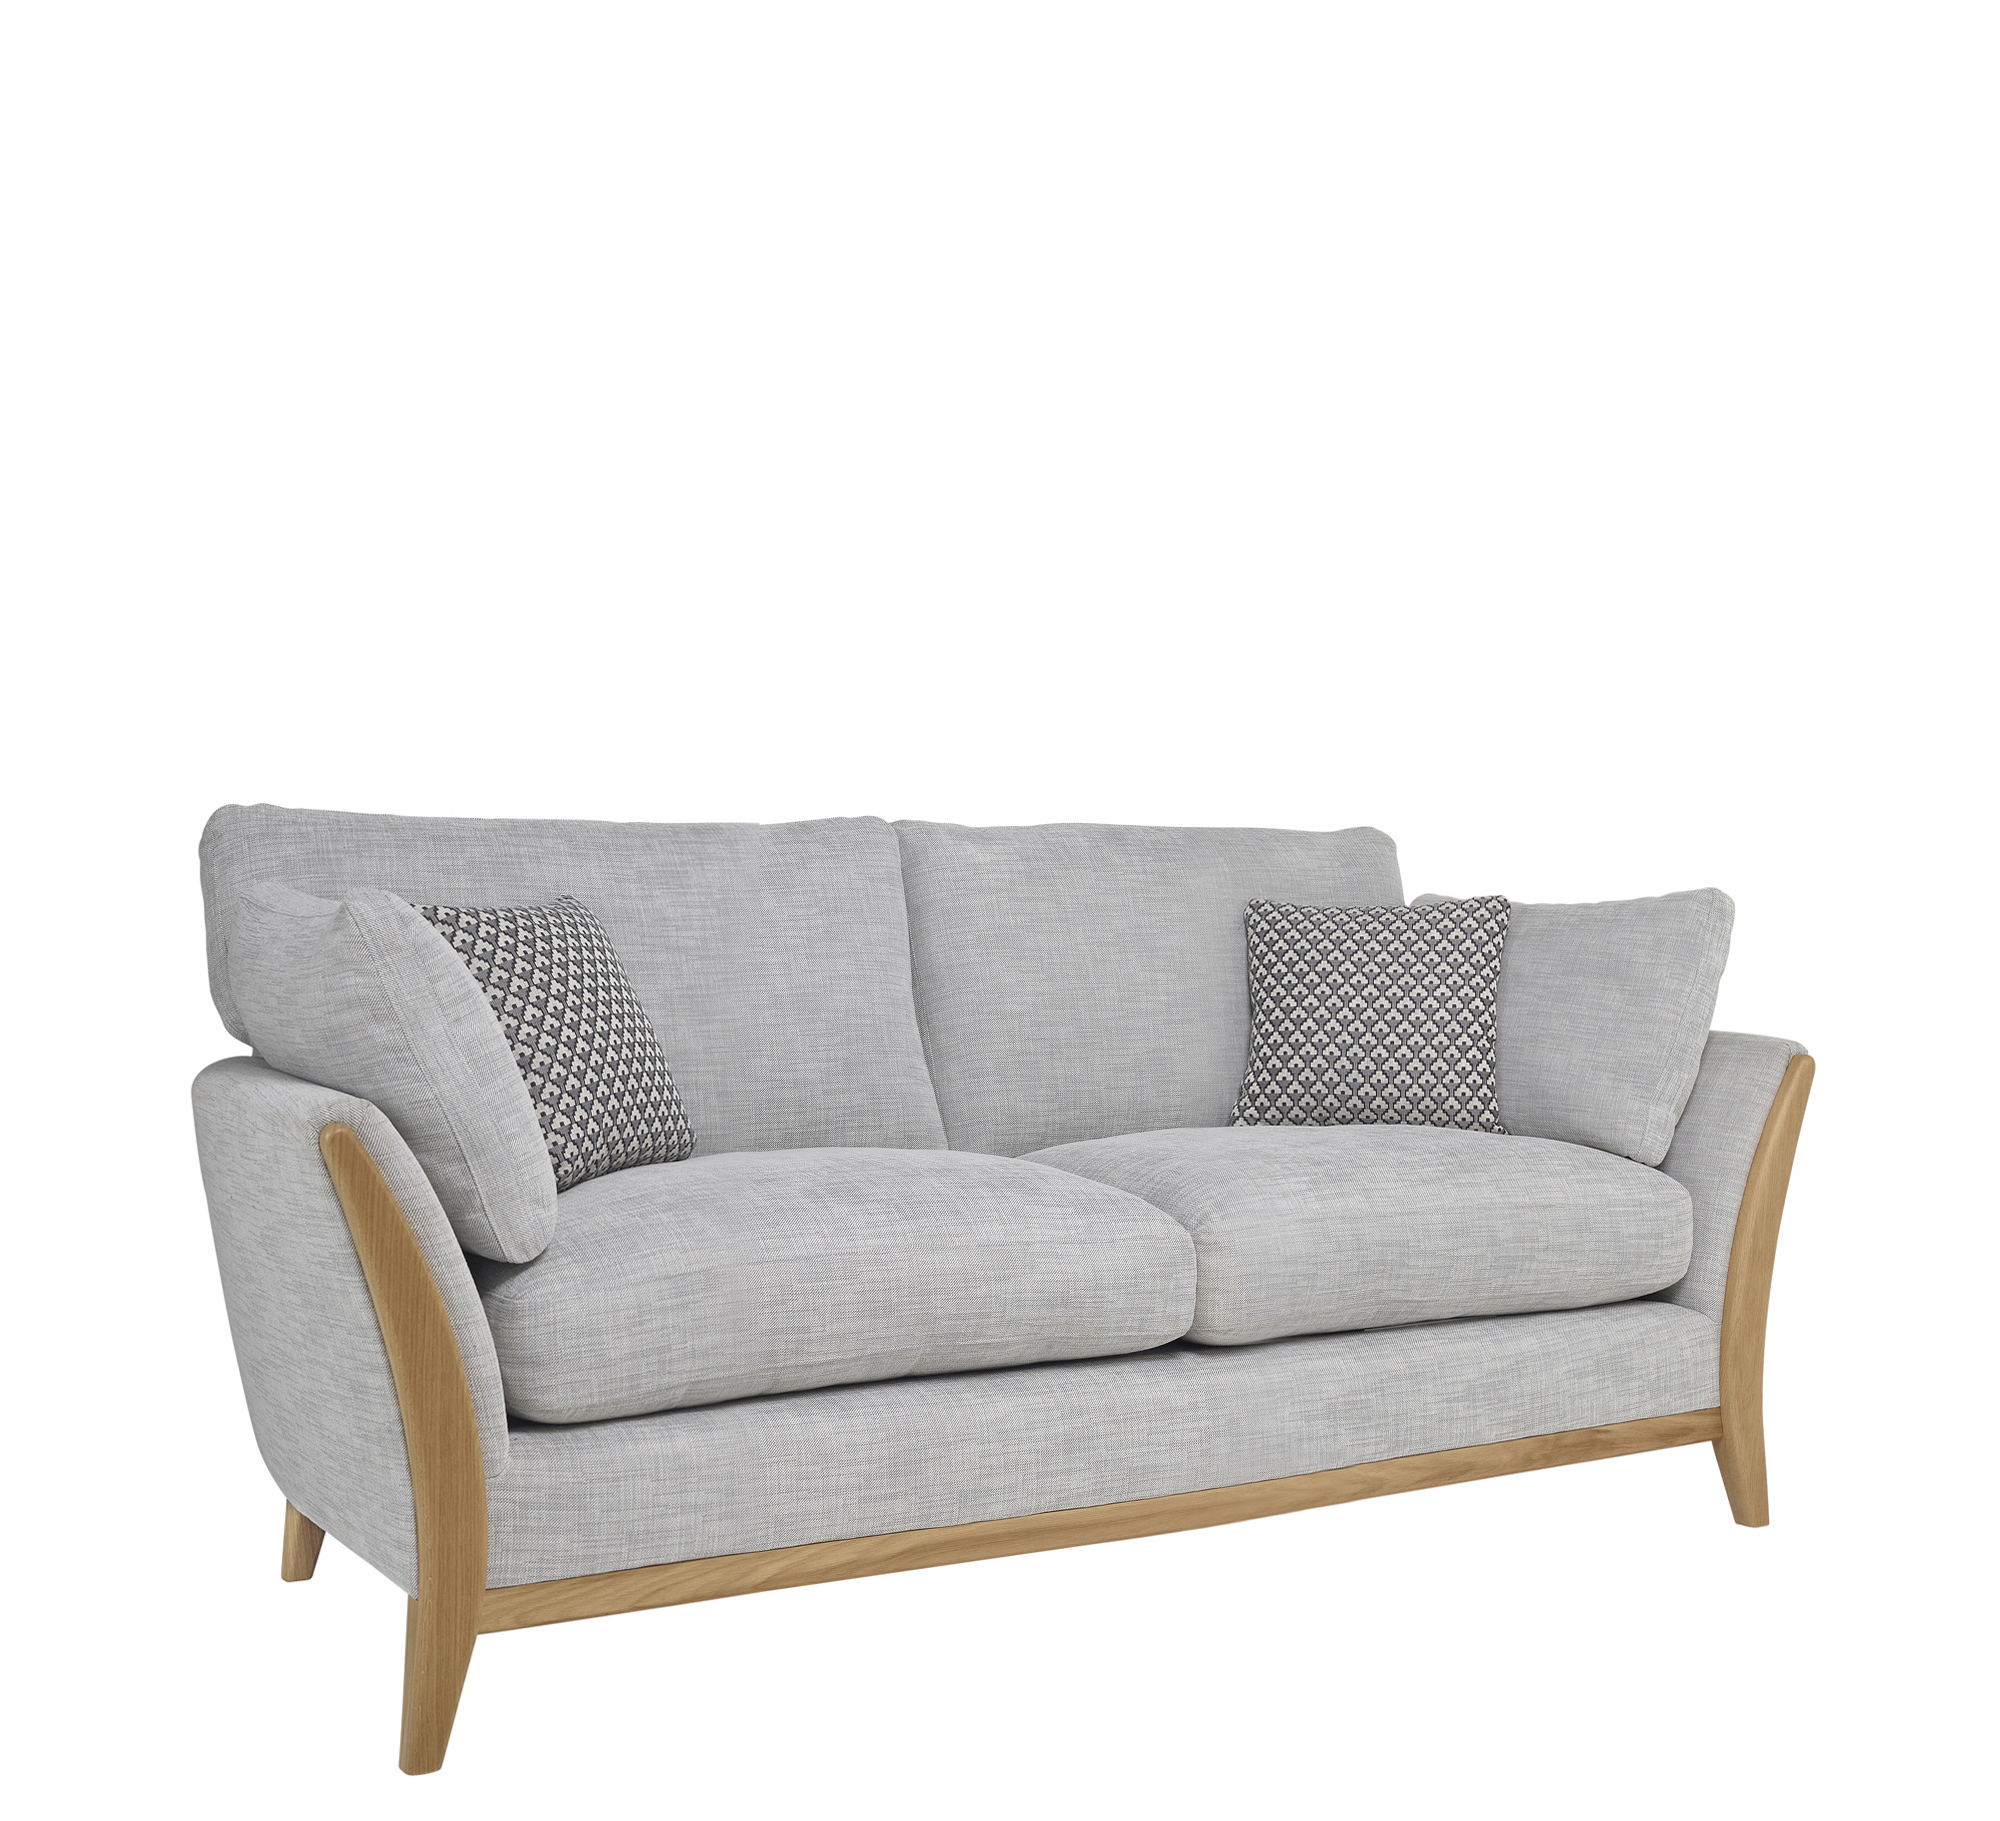 Serroni Large Sofa – Large Sofas – Ercol Furniture Pertaining To Big Sofa Chairs (View 9 of 15)